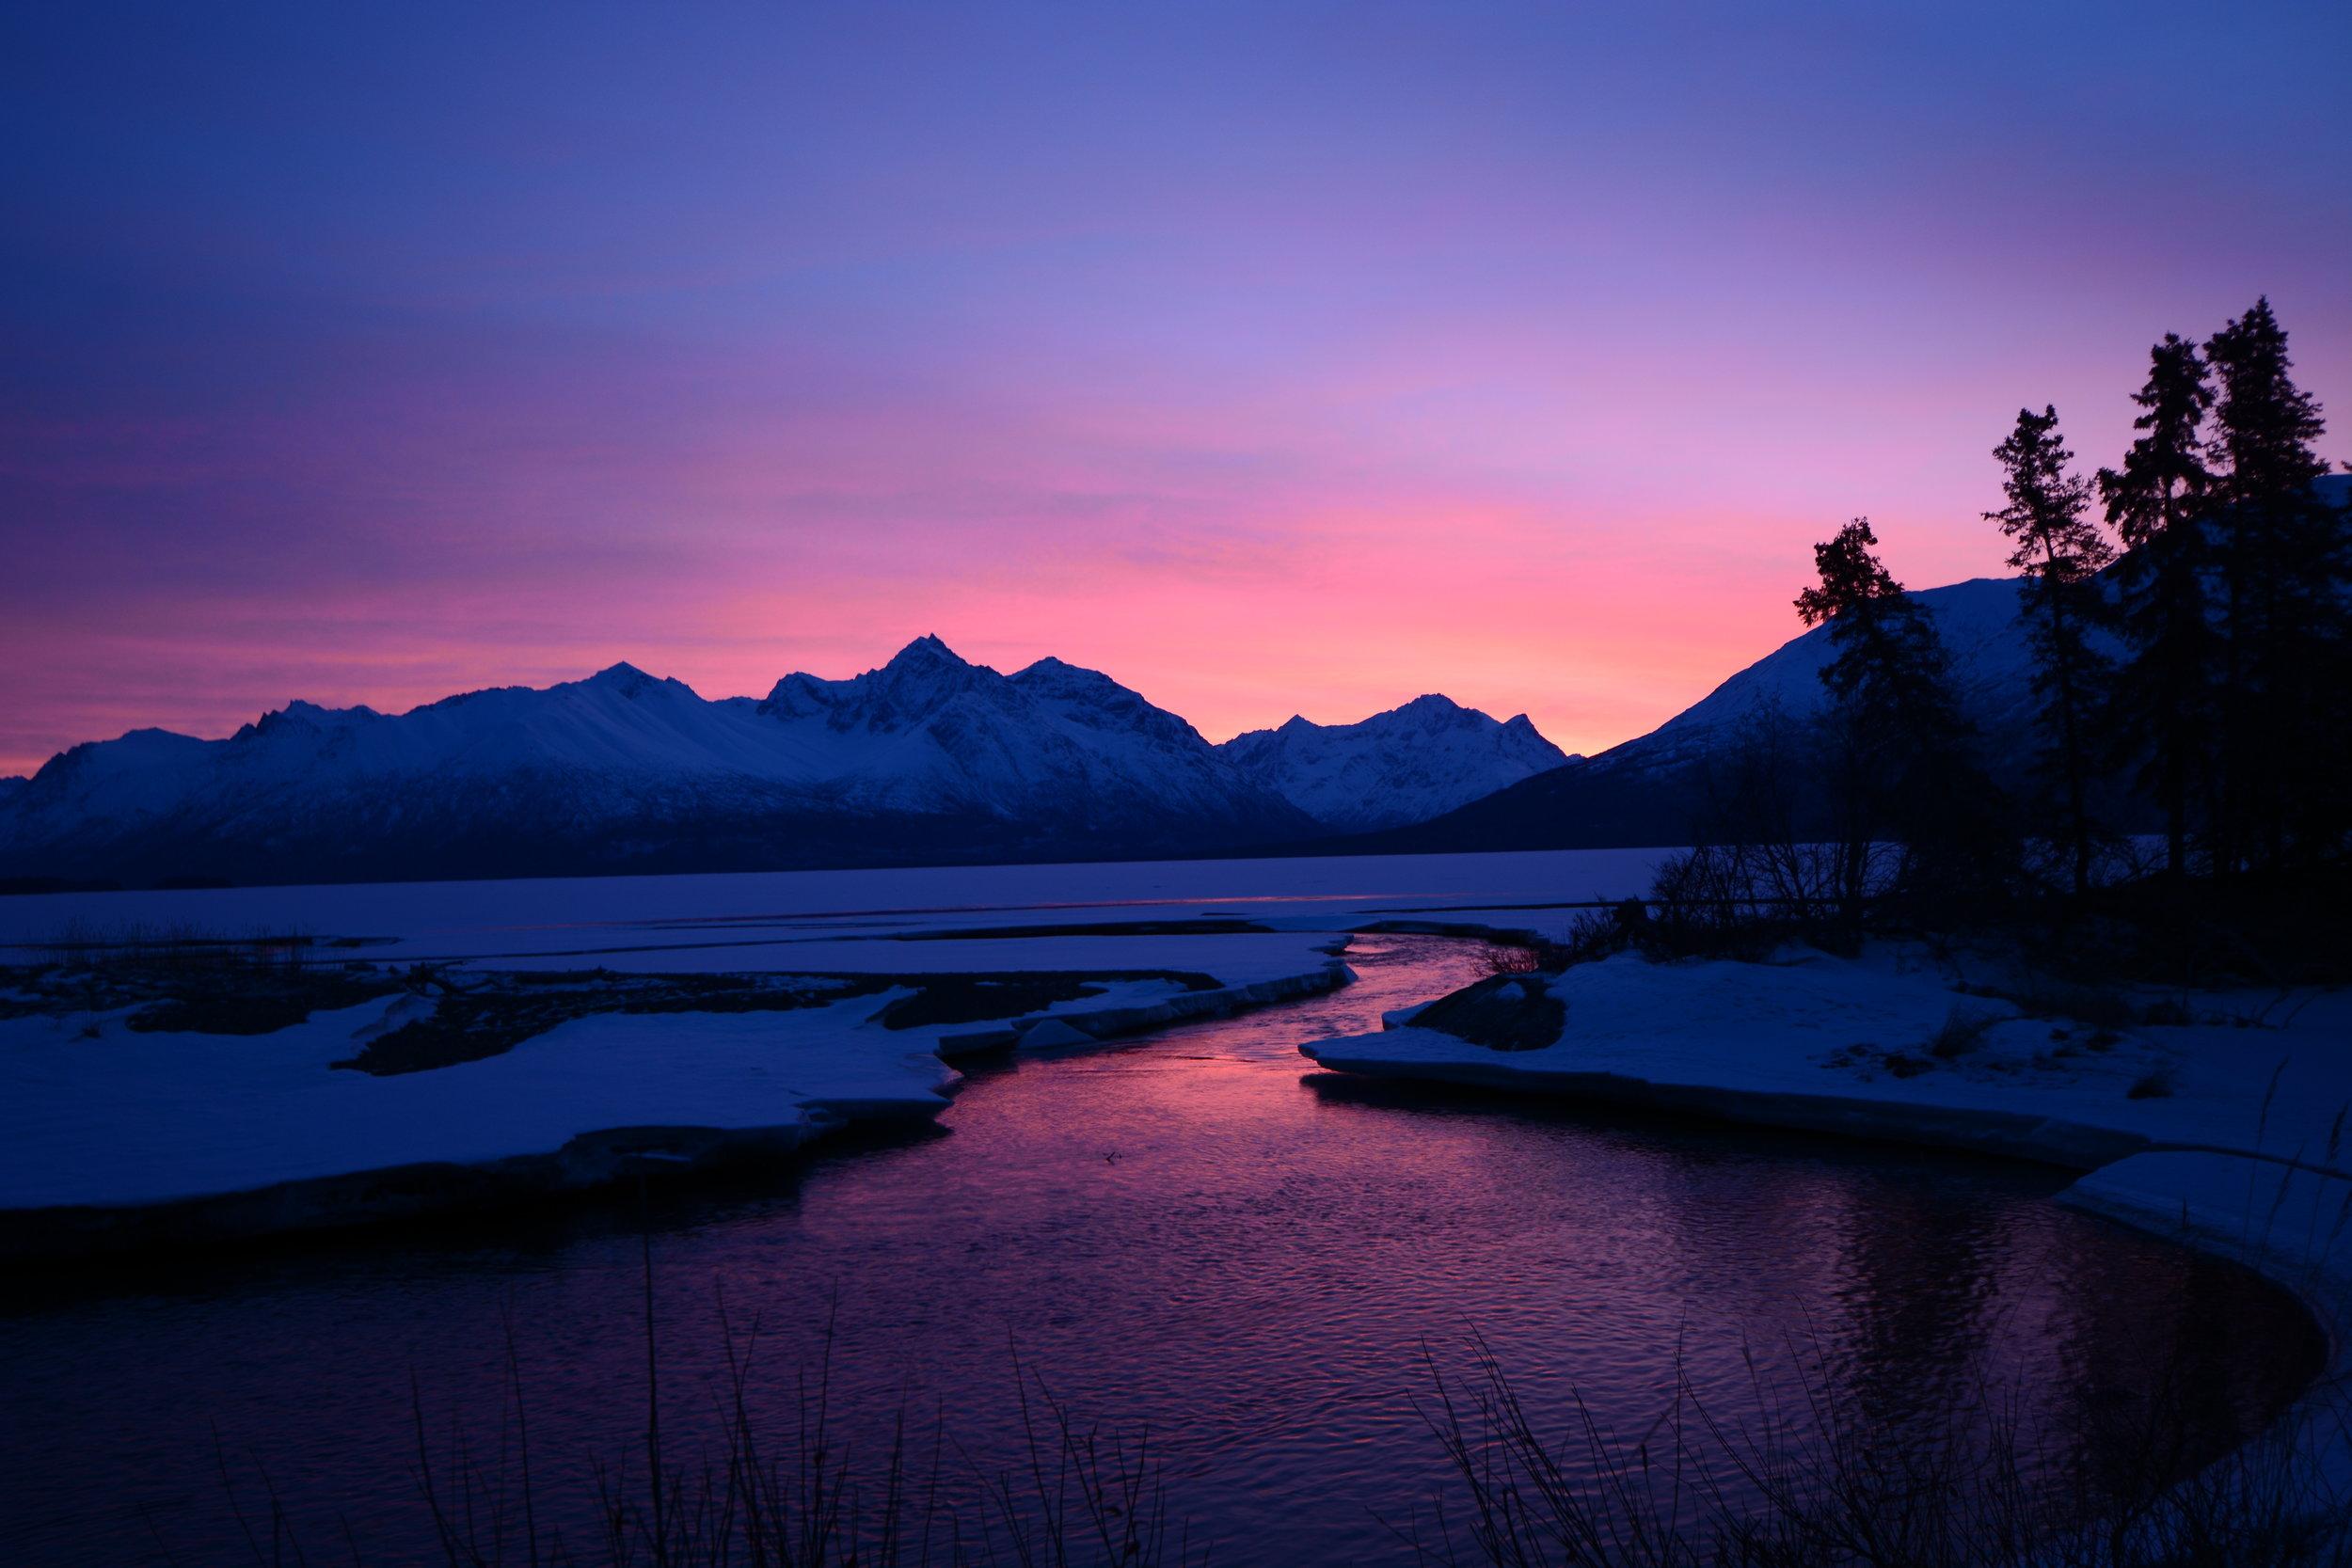 sunrise-priest-rock-cabin-lake-clark-national-park-alaska.jpg